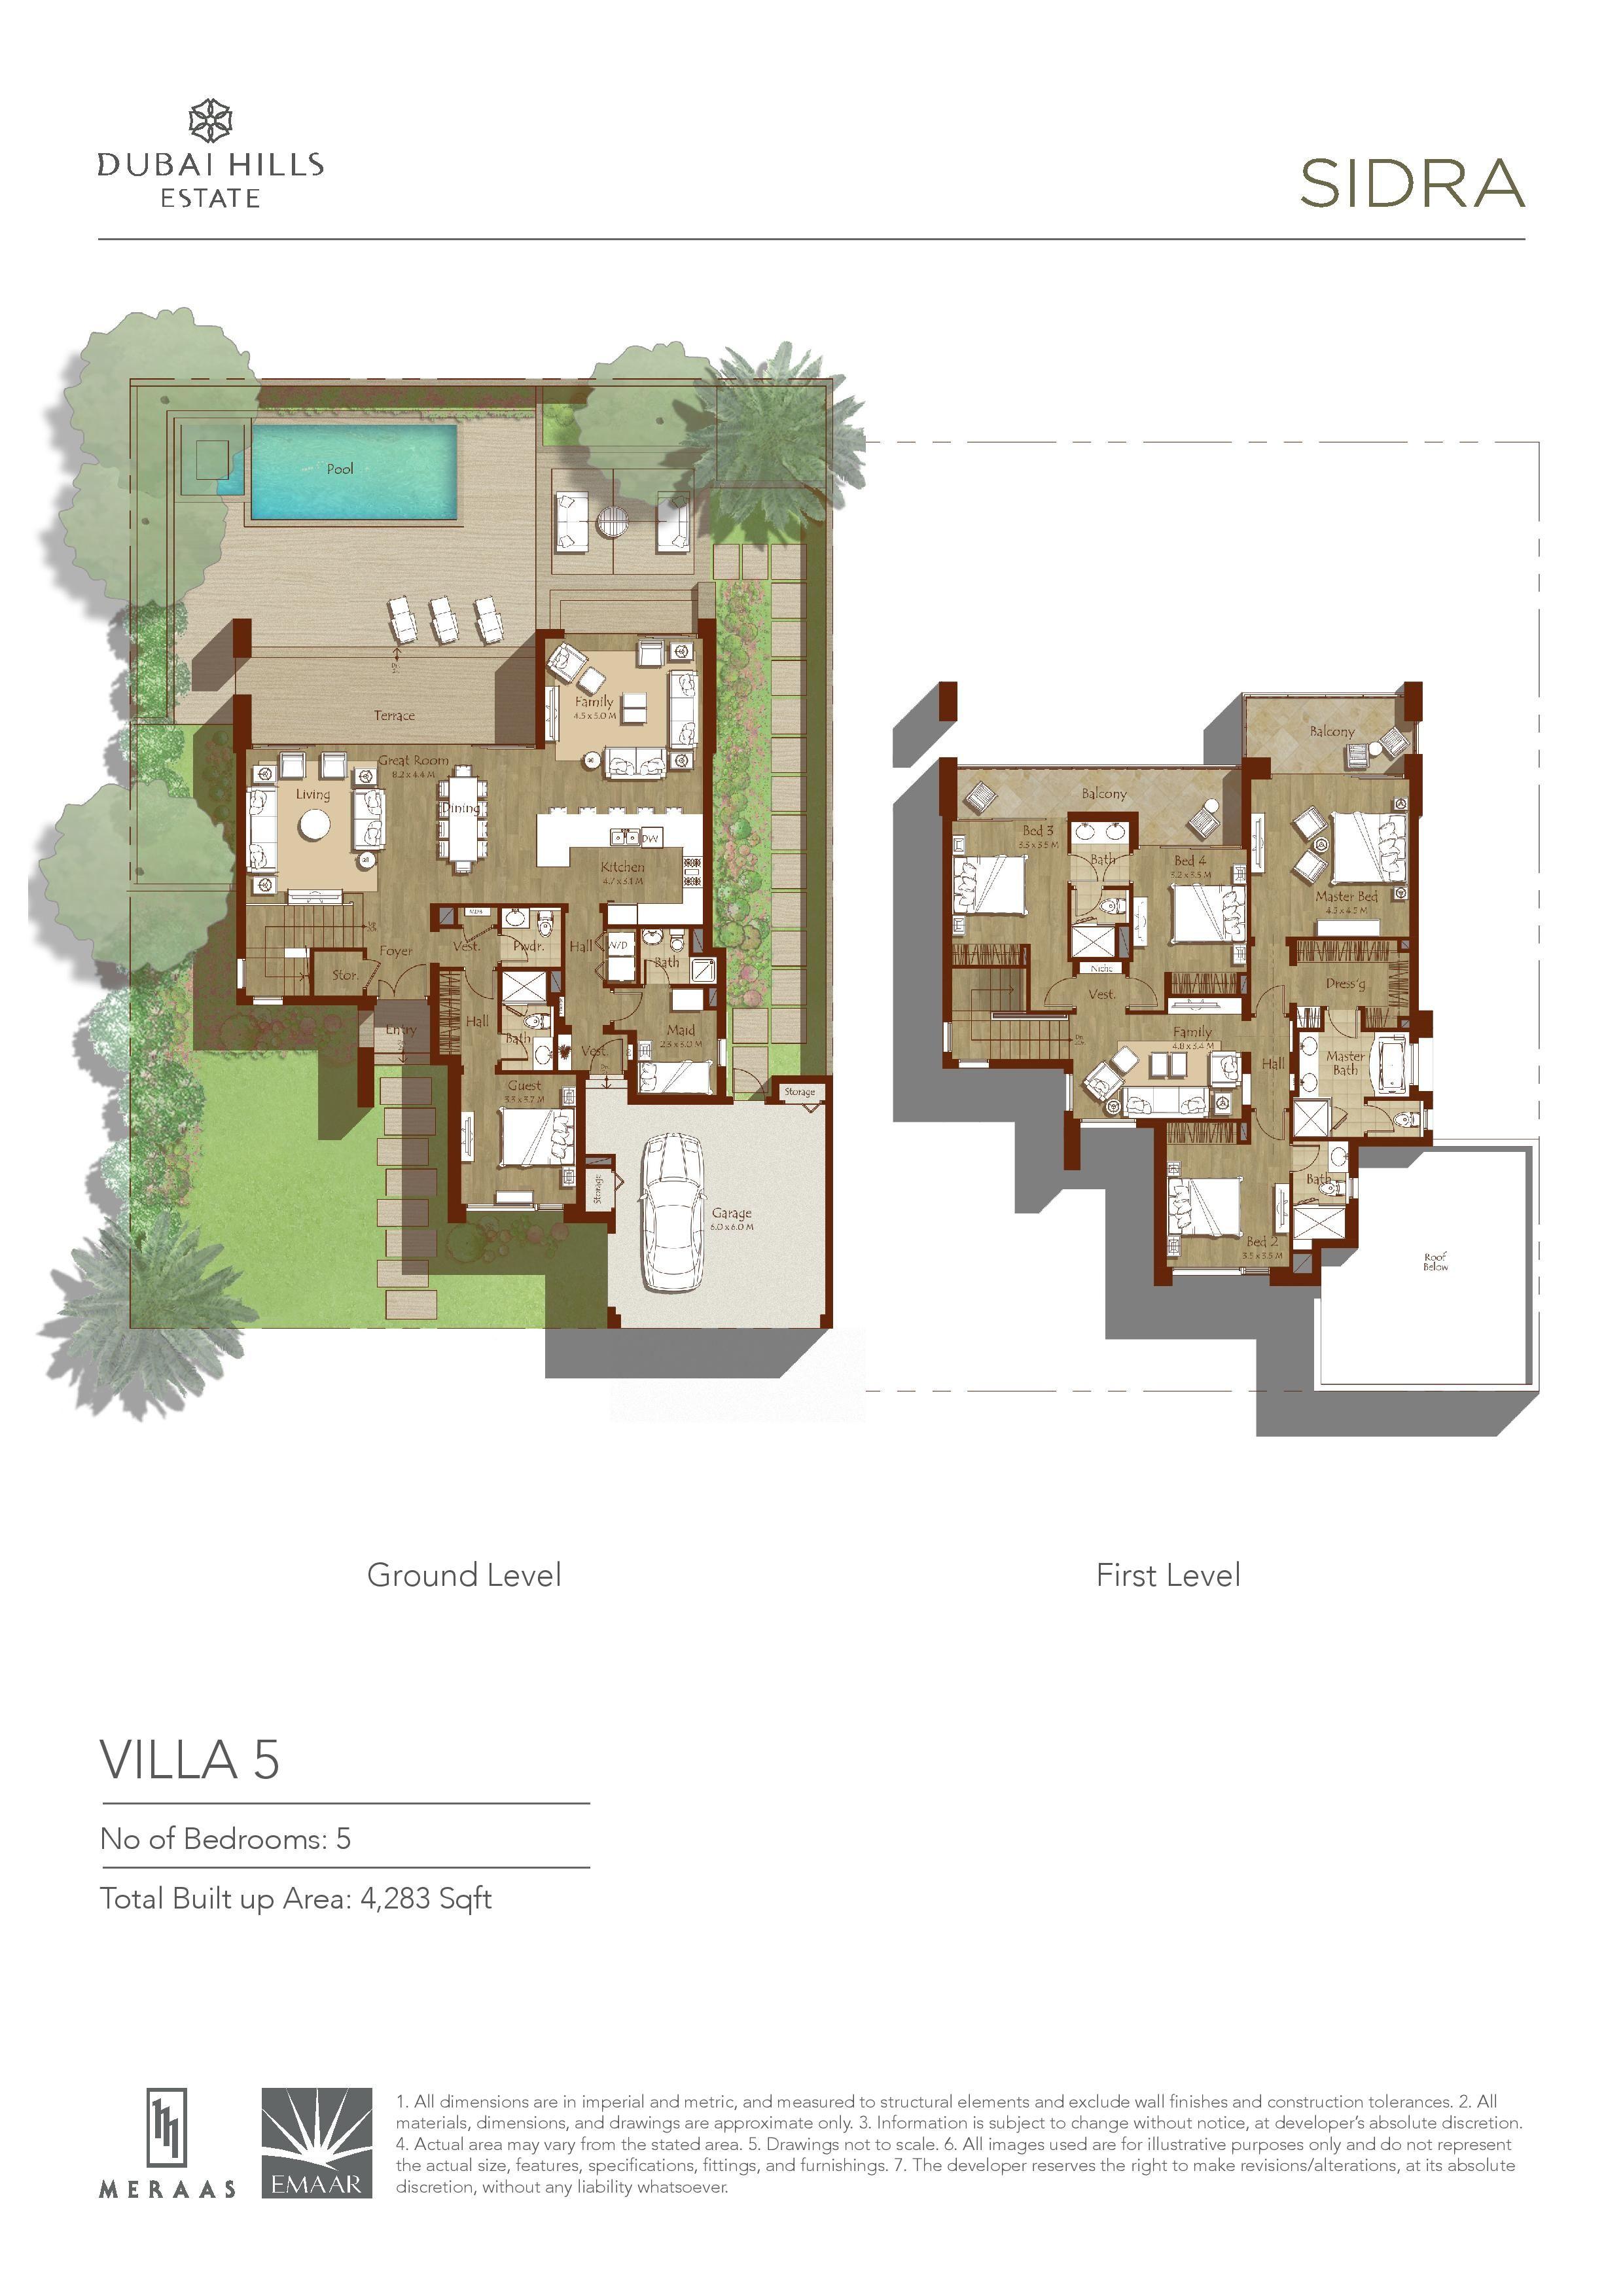 Sidra Villa Floor Plans Dubai Hills Estates Floor Plans Diy House Plans Villa Plan